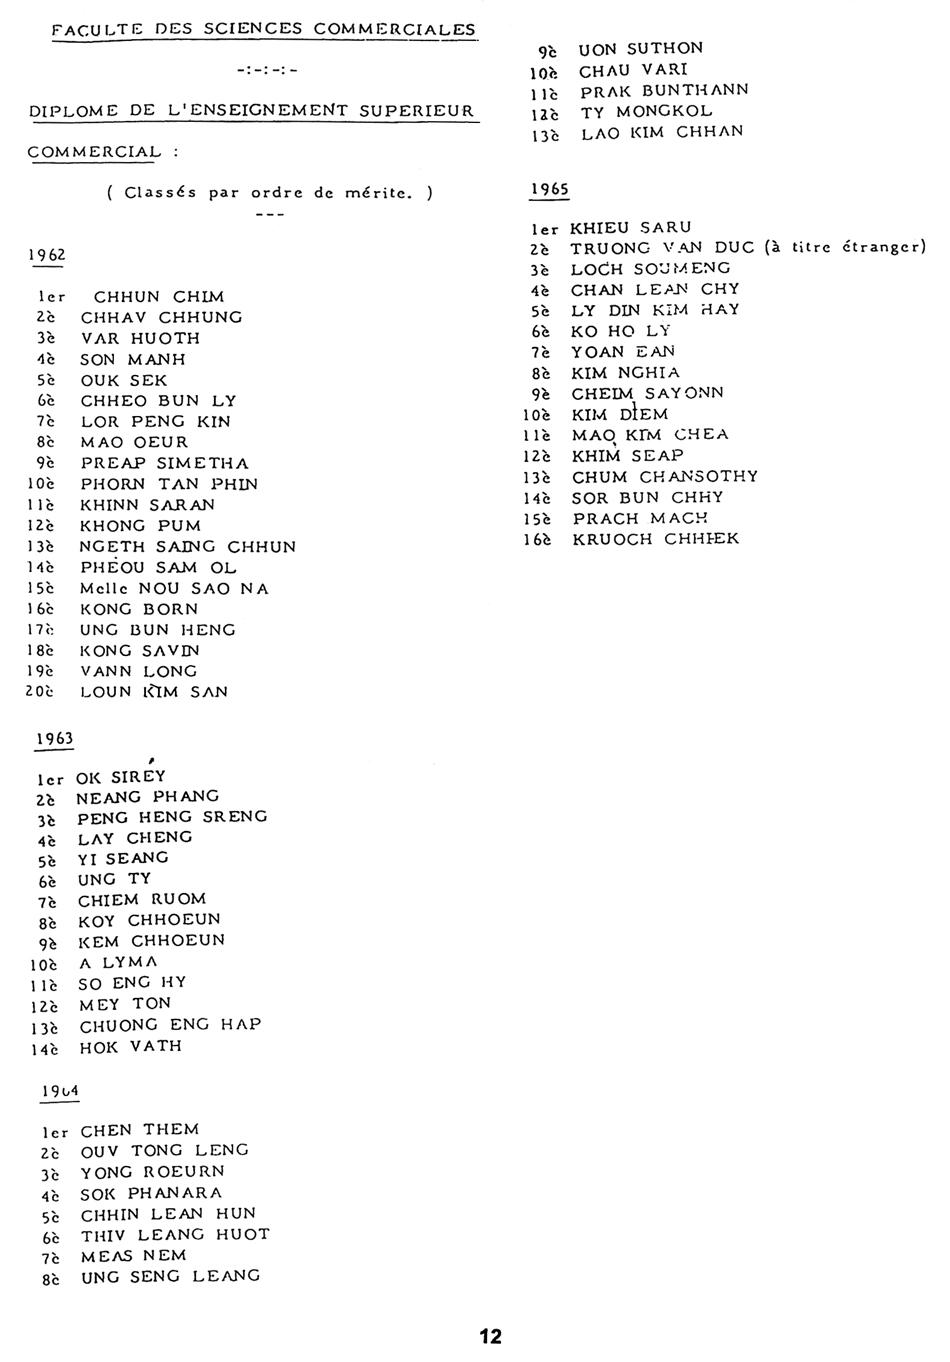 All/correspondance/CorrespondancePrive/2013/Octobre/id1480/photo012.jpg